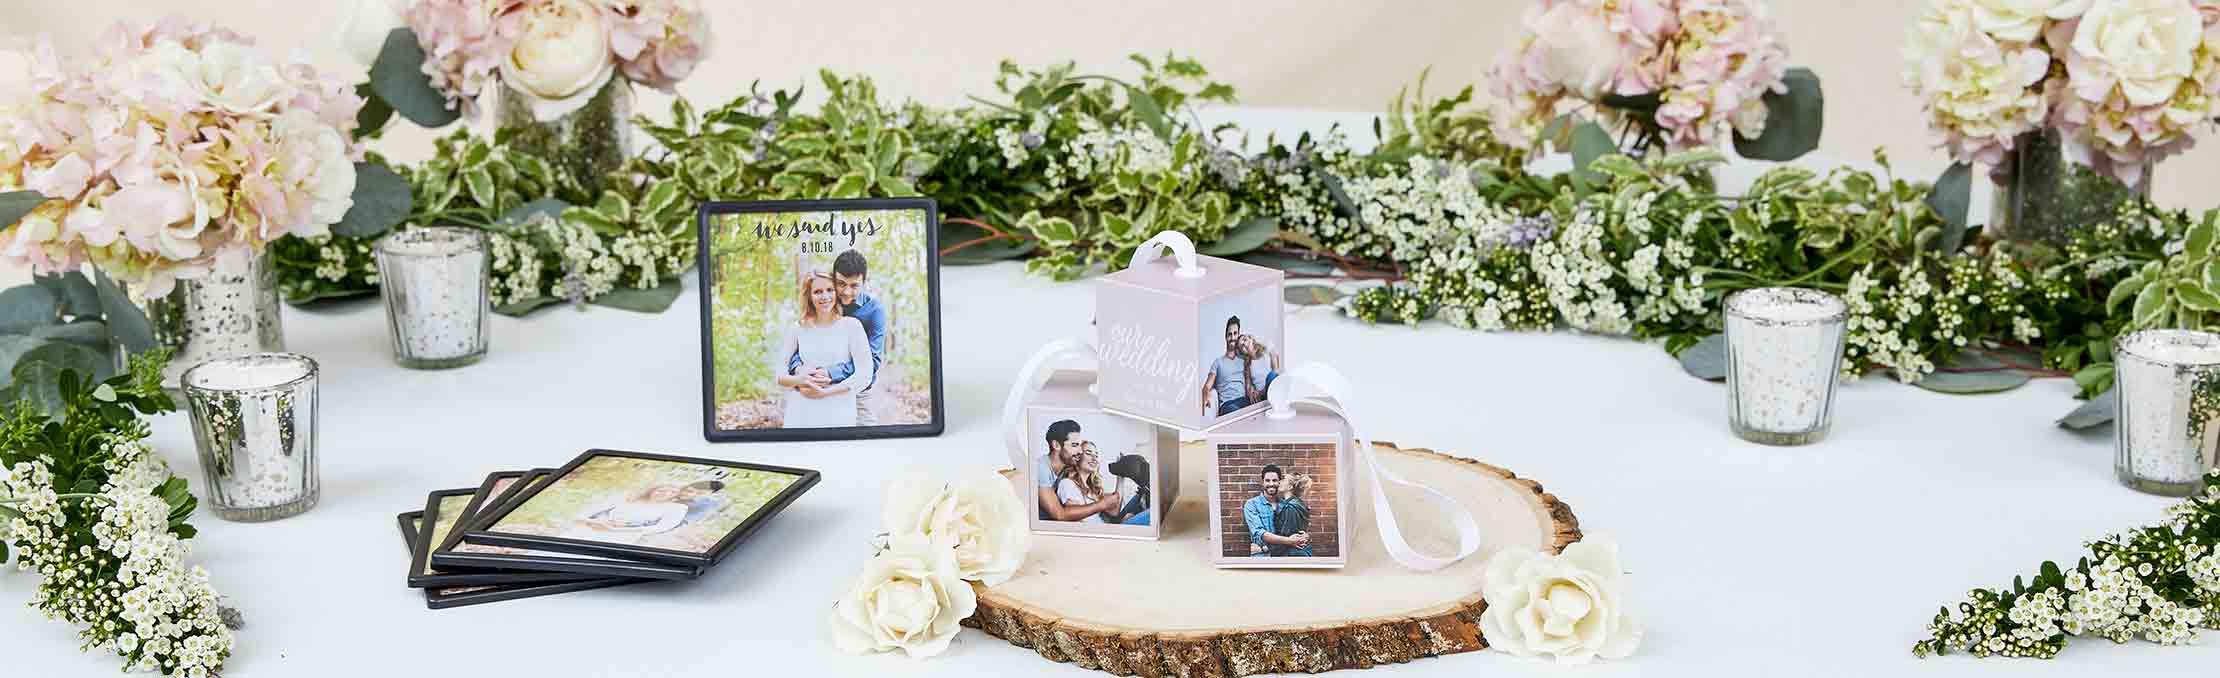 Wedding Party Favor Ideas.Ideas For Wedding Party Favors Walgreens Photo Blog Walgreens Photo